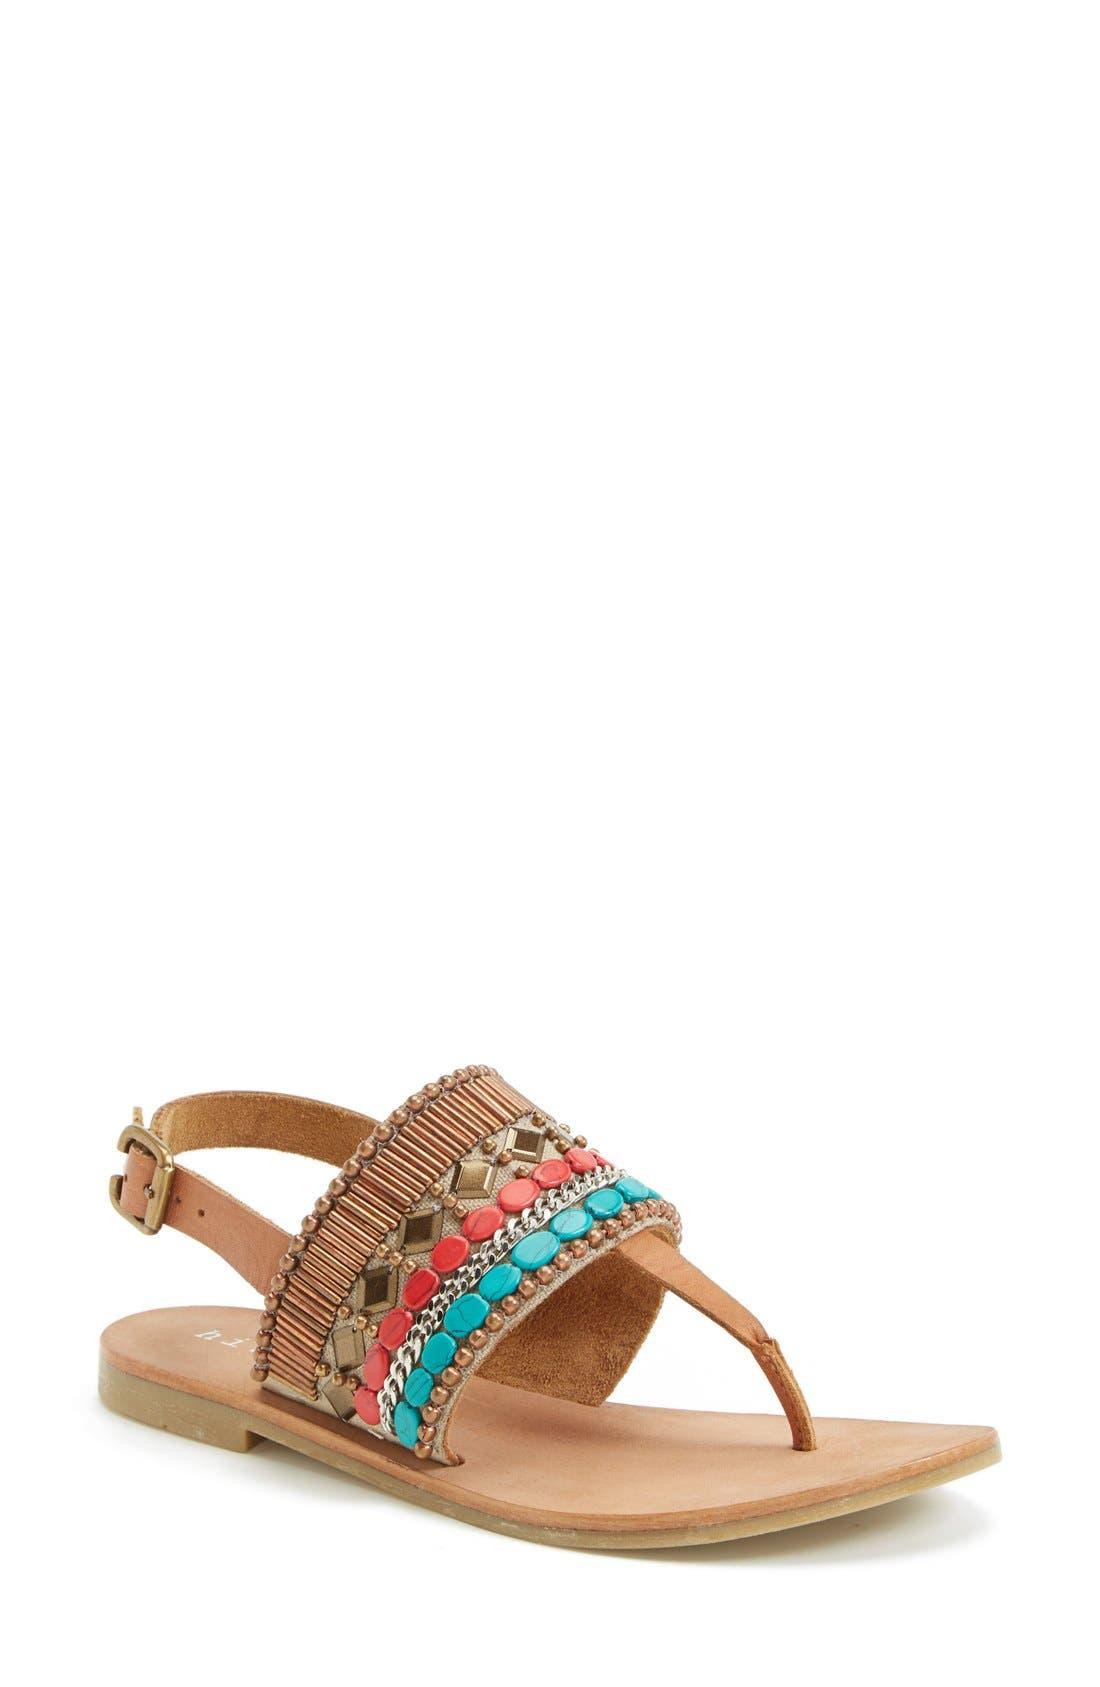 Main Image - Hinge Beaded Thong Sandal (Women)